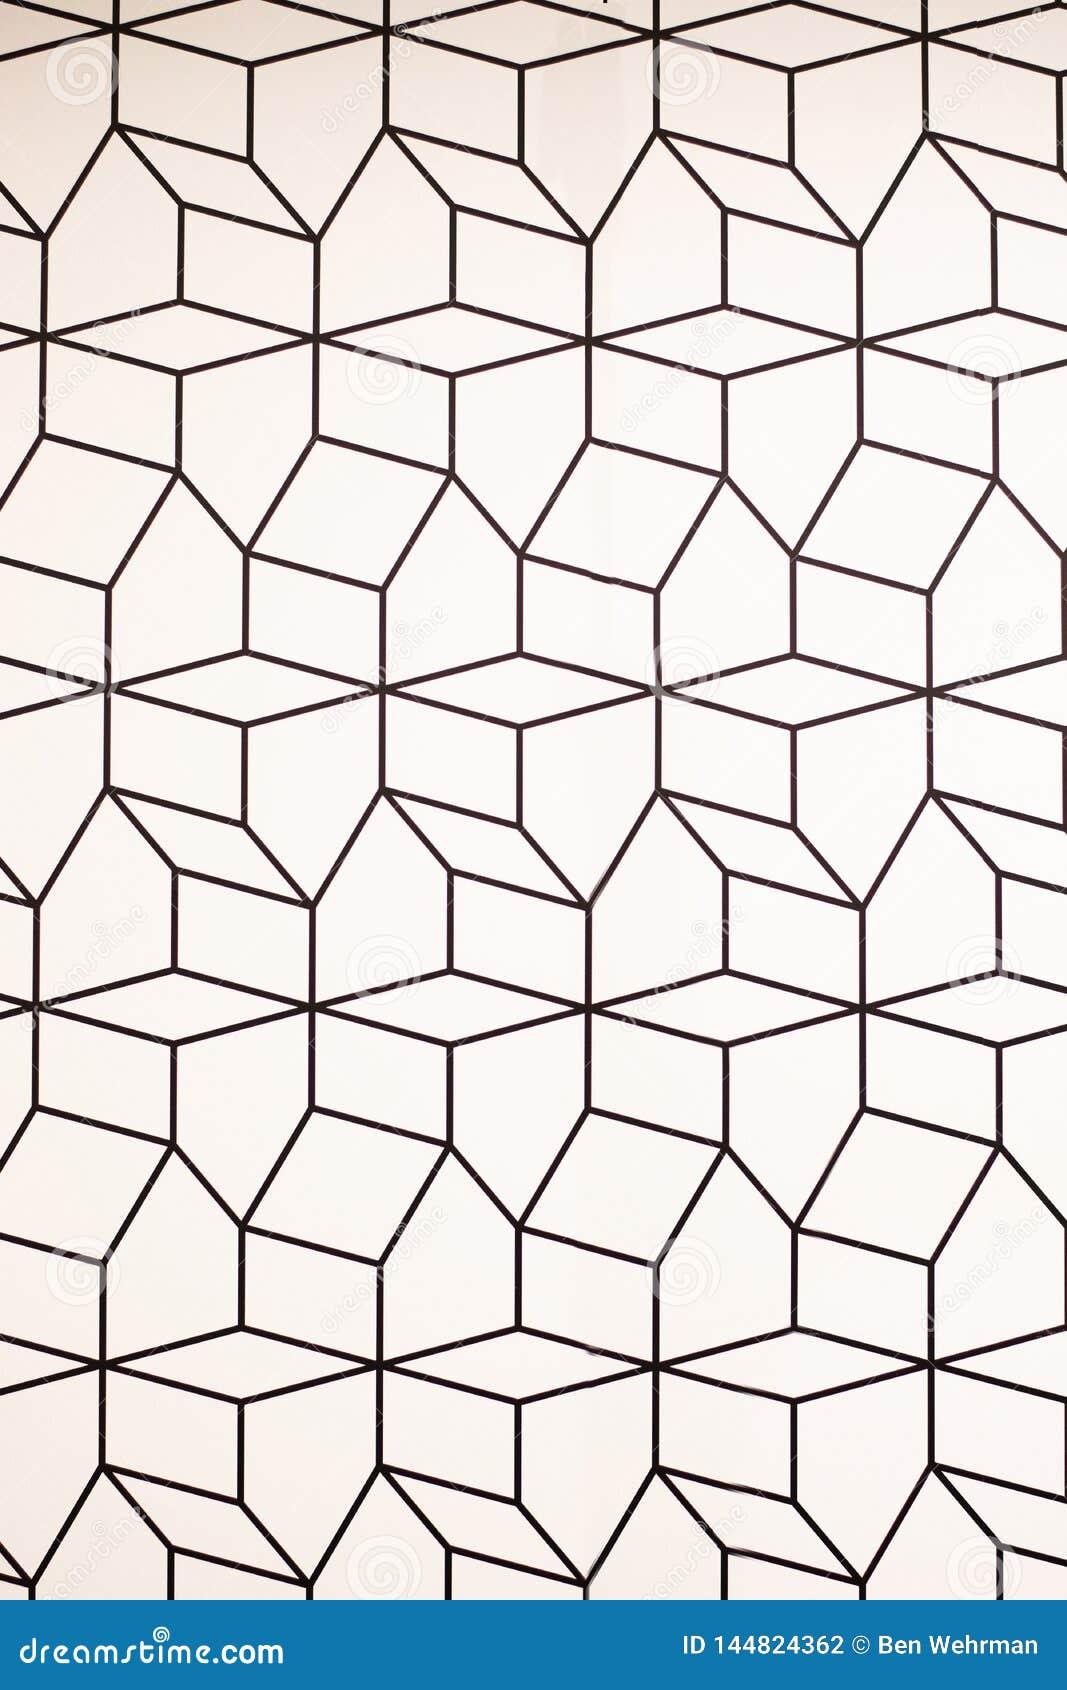 Wall Pattern Texture